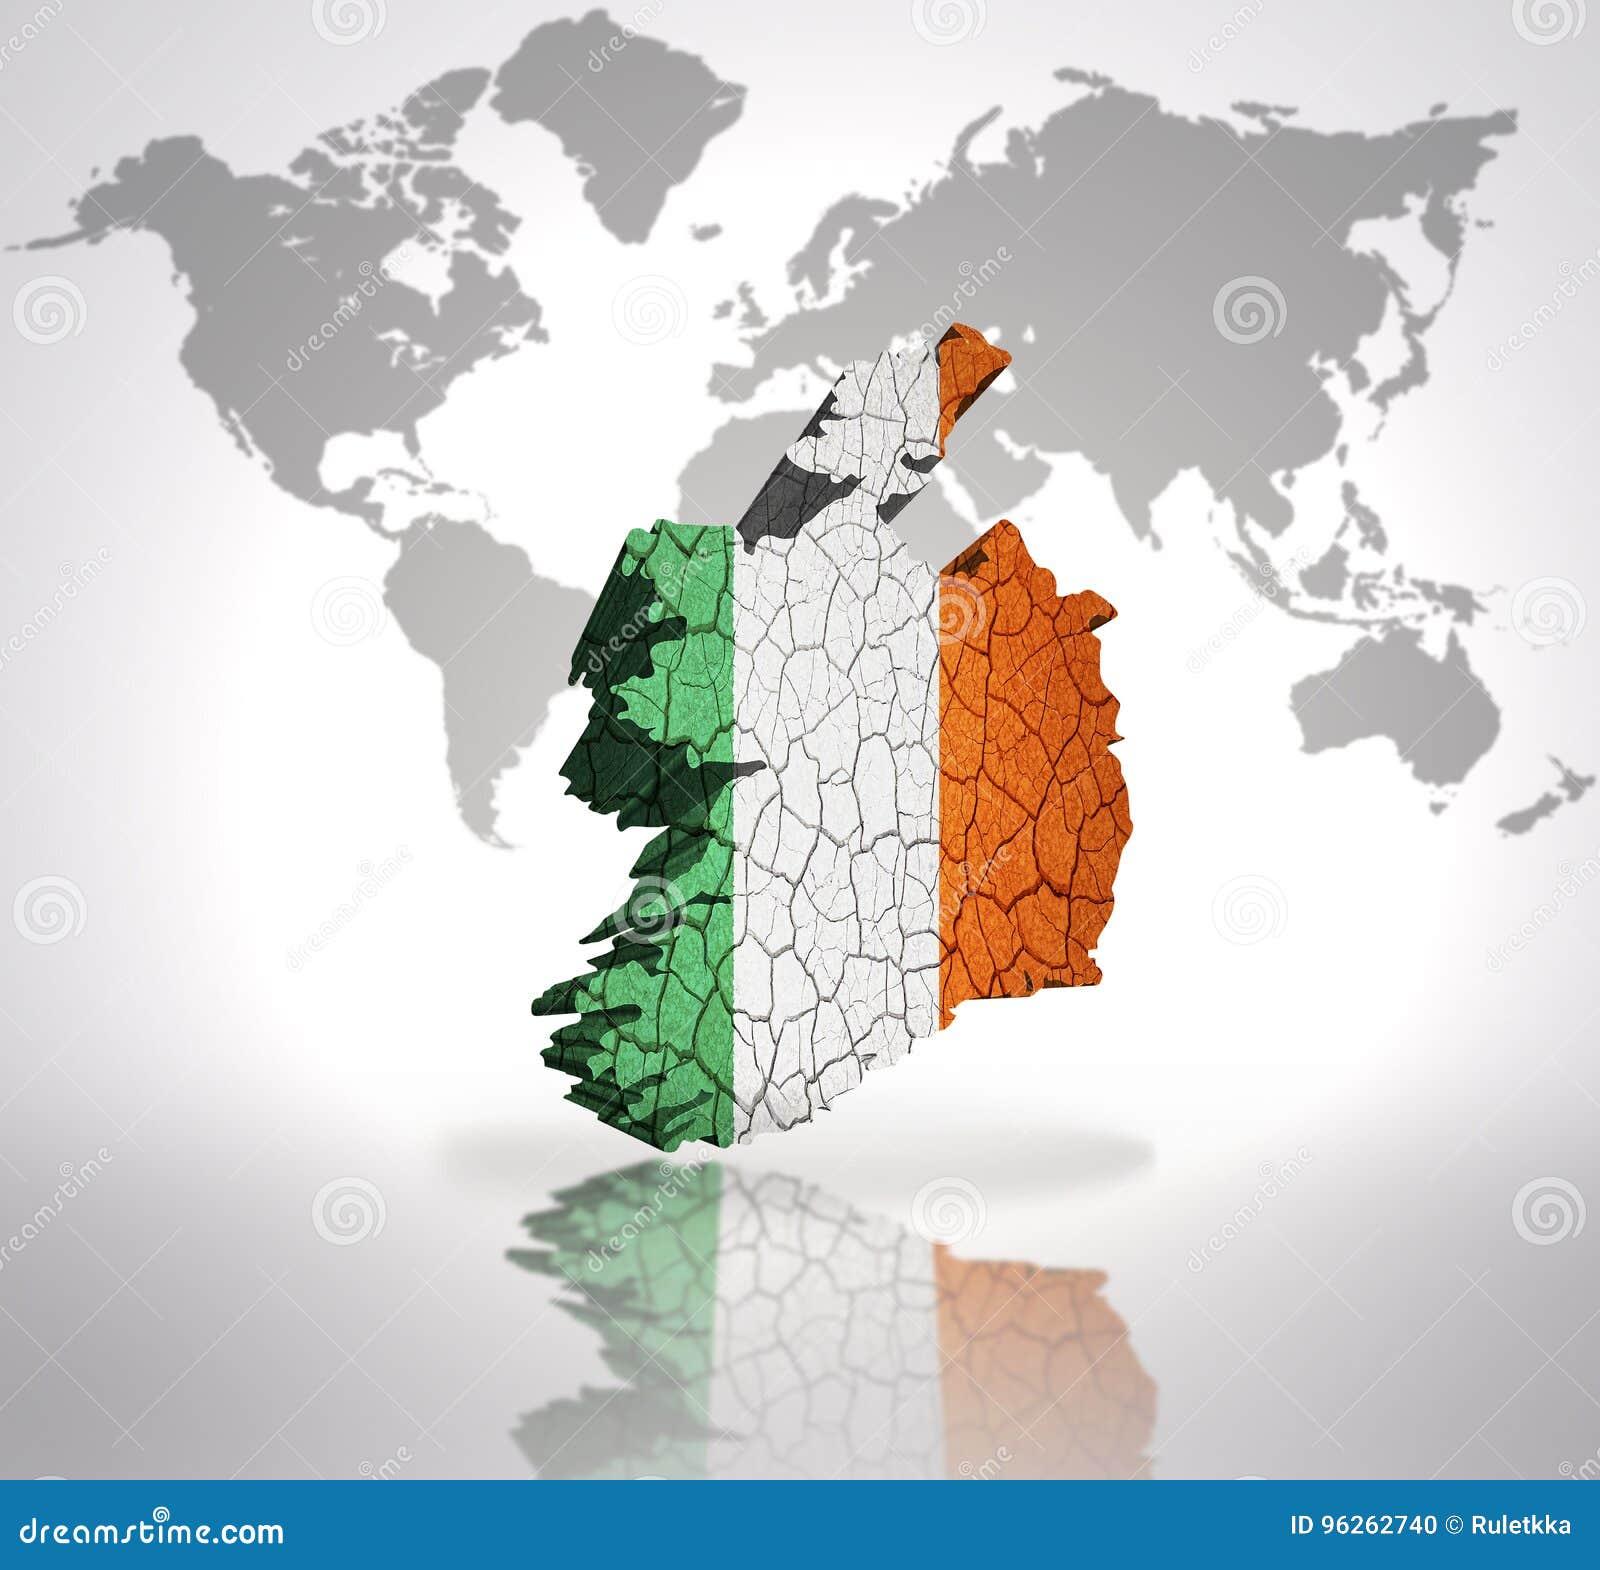 Map Of Ireland On World Map.Map Of Ireland Stock Illustration Illustration Of Mirror 96262740